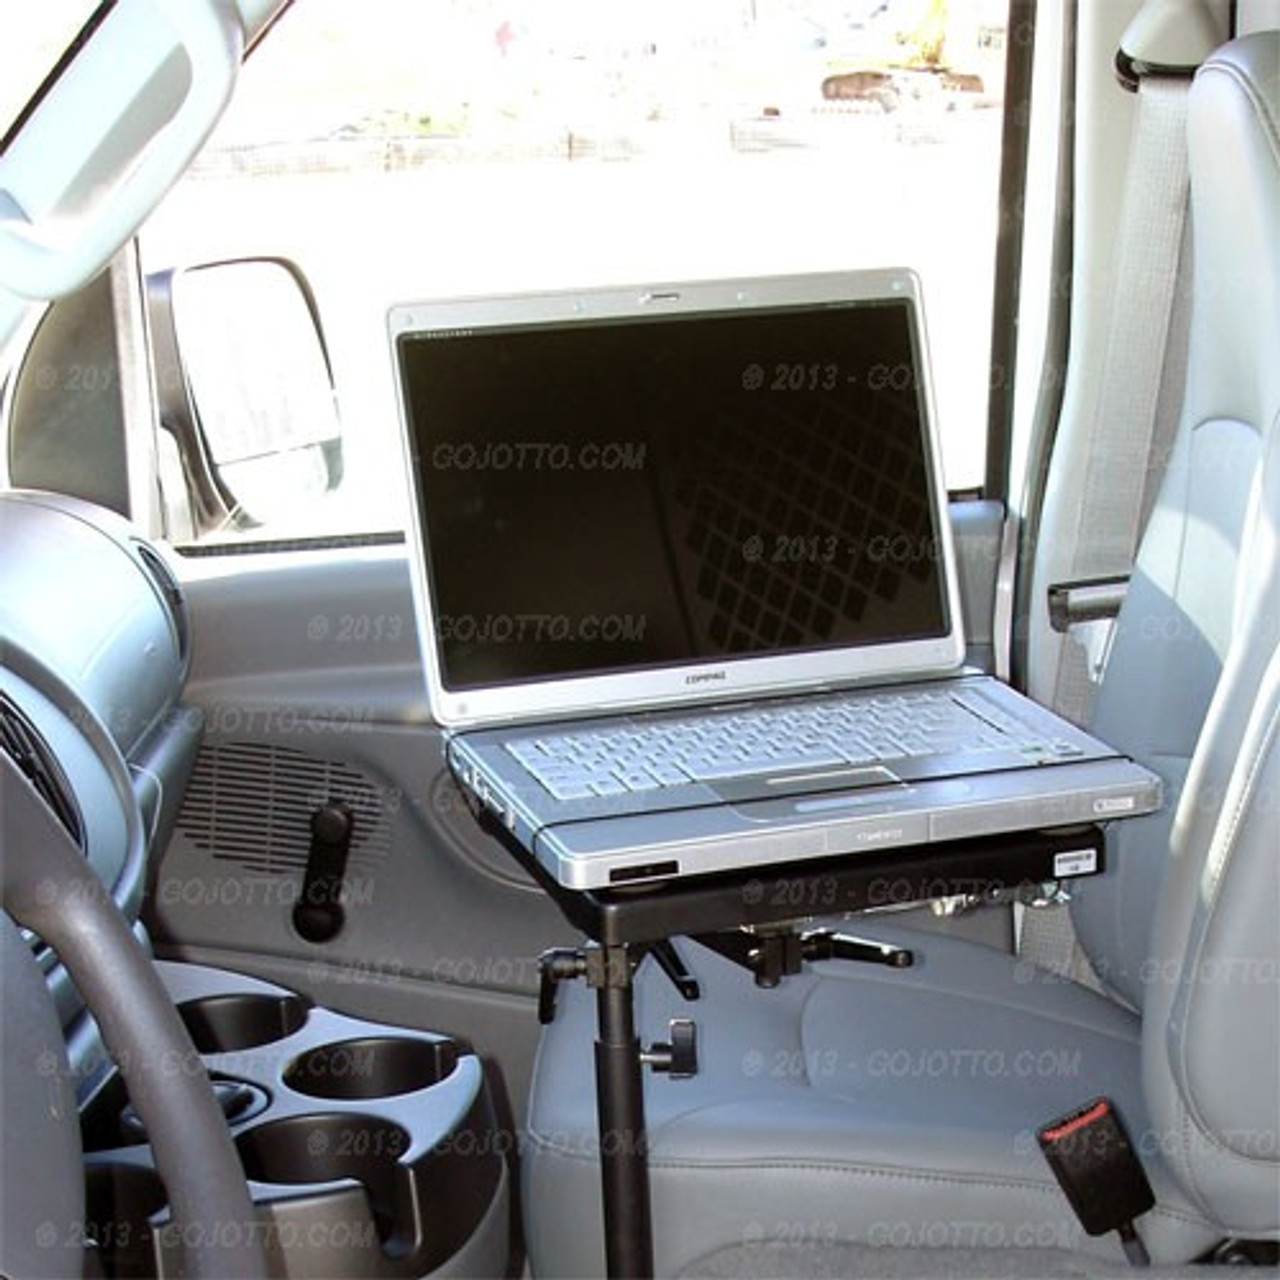 E Series Van Laptop Mount Computer Stand by Jotto Desk 1999+